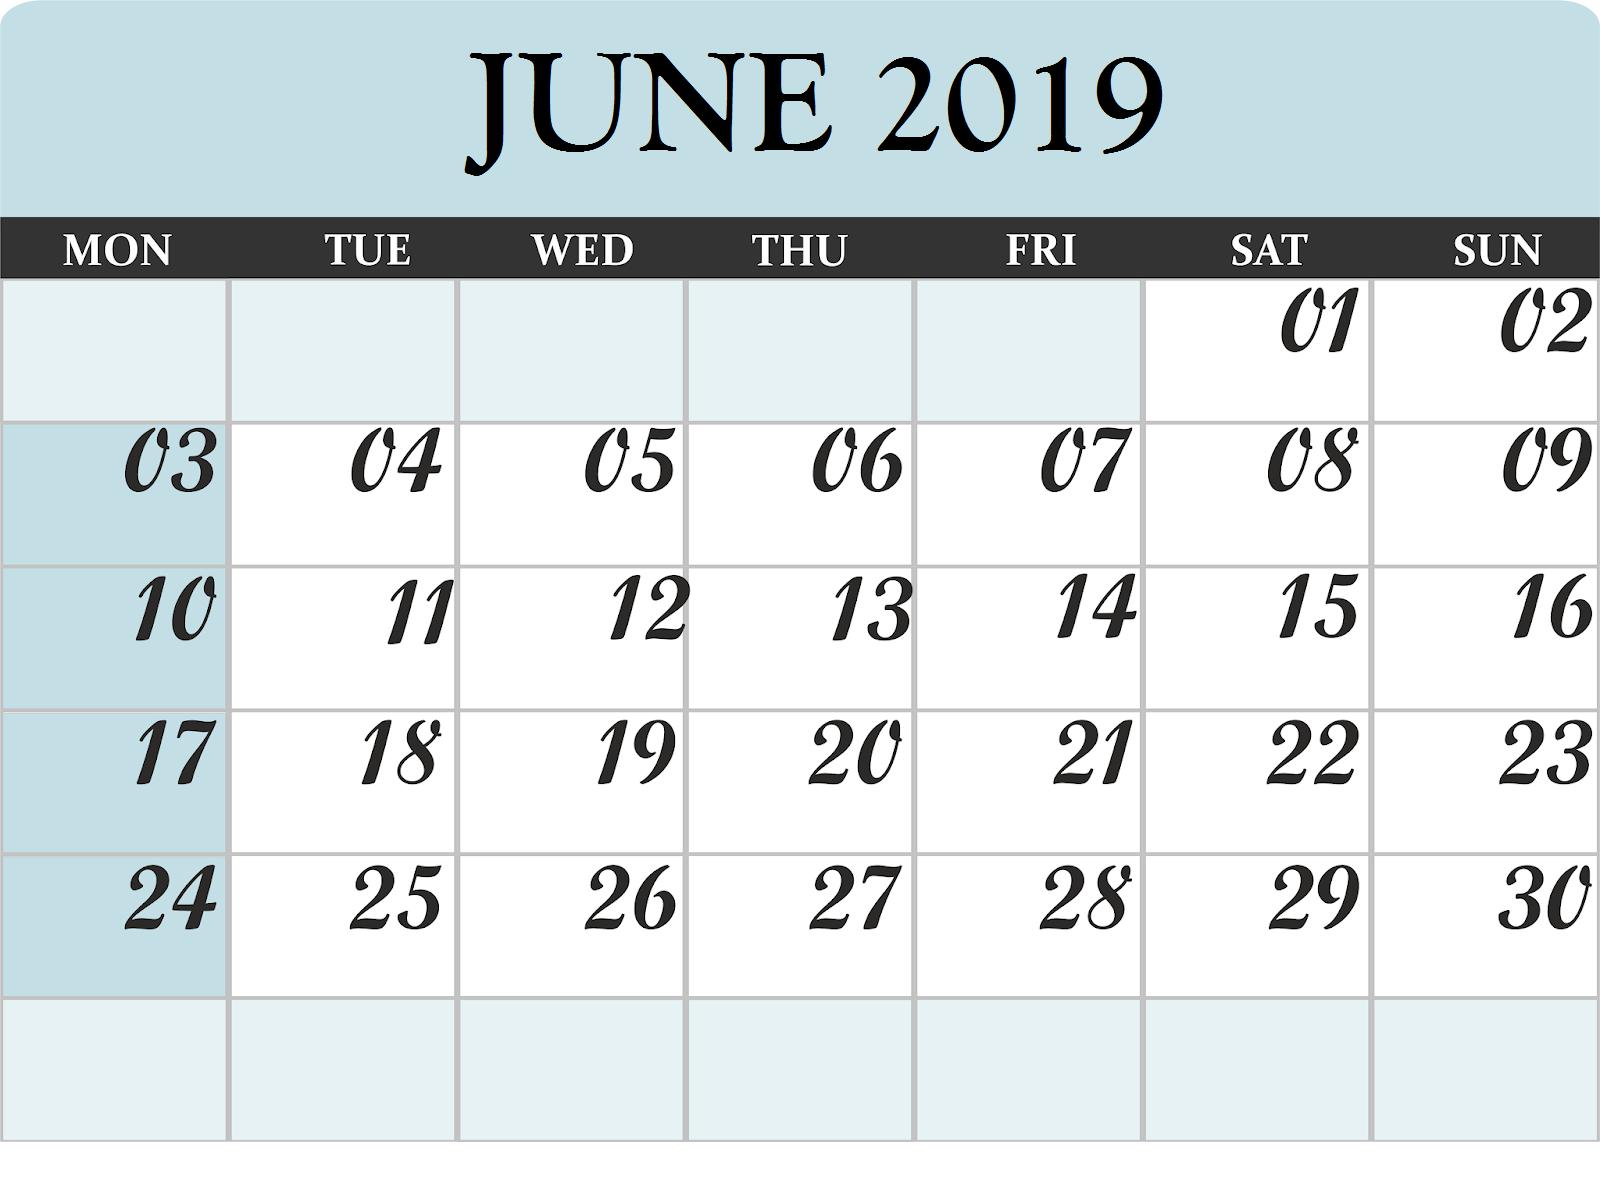 Print June 2019 Desk Calendar Free